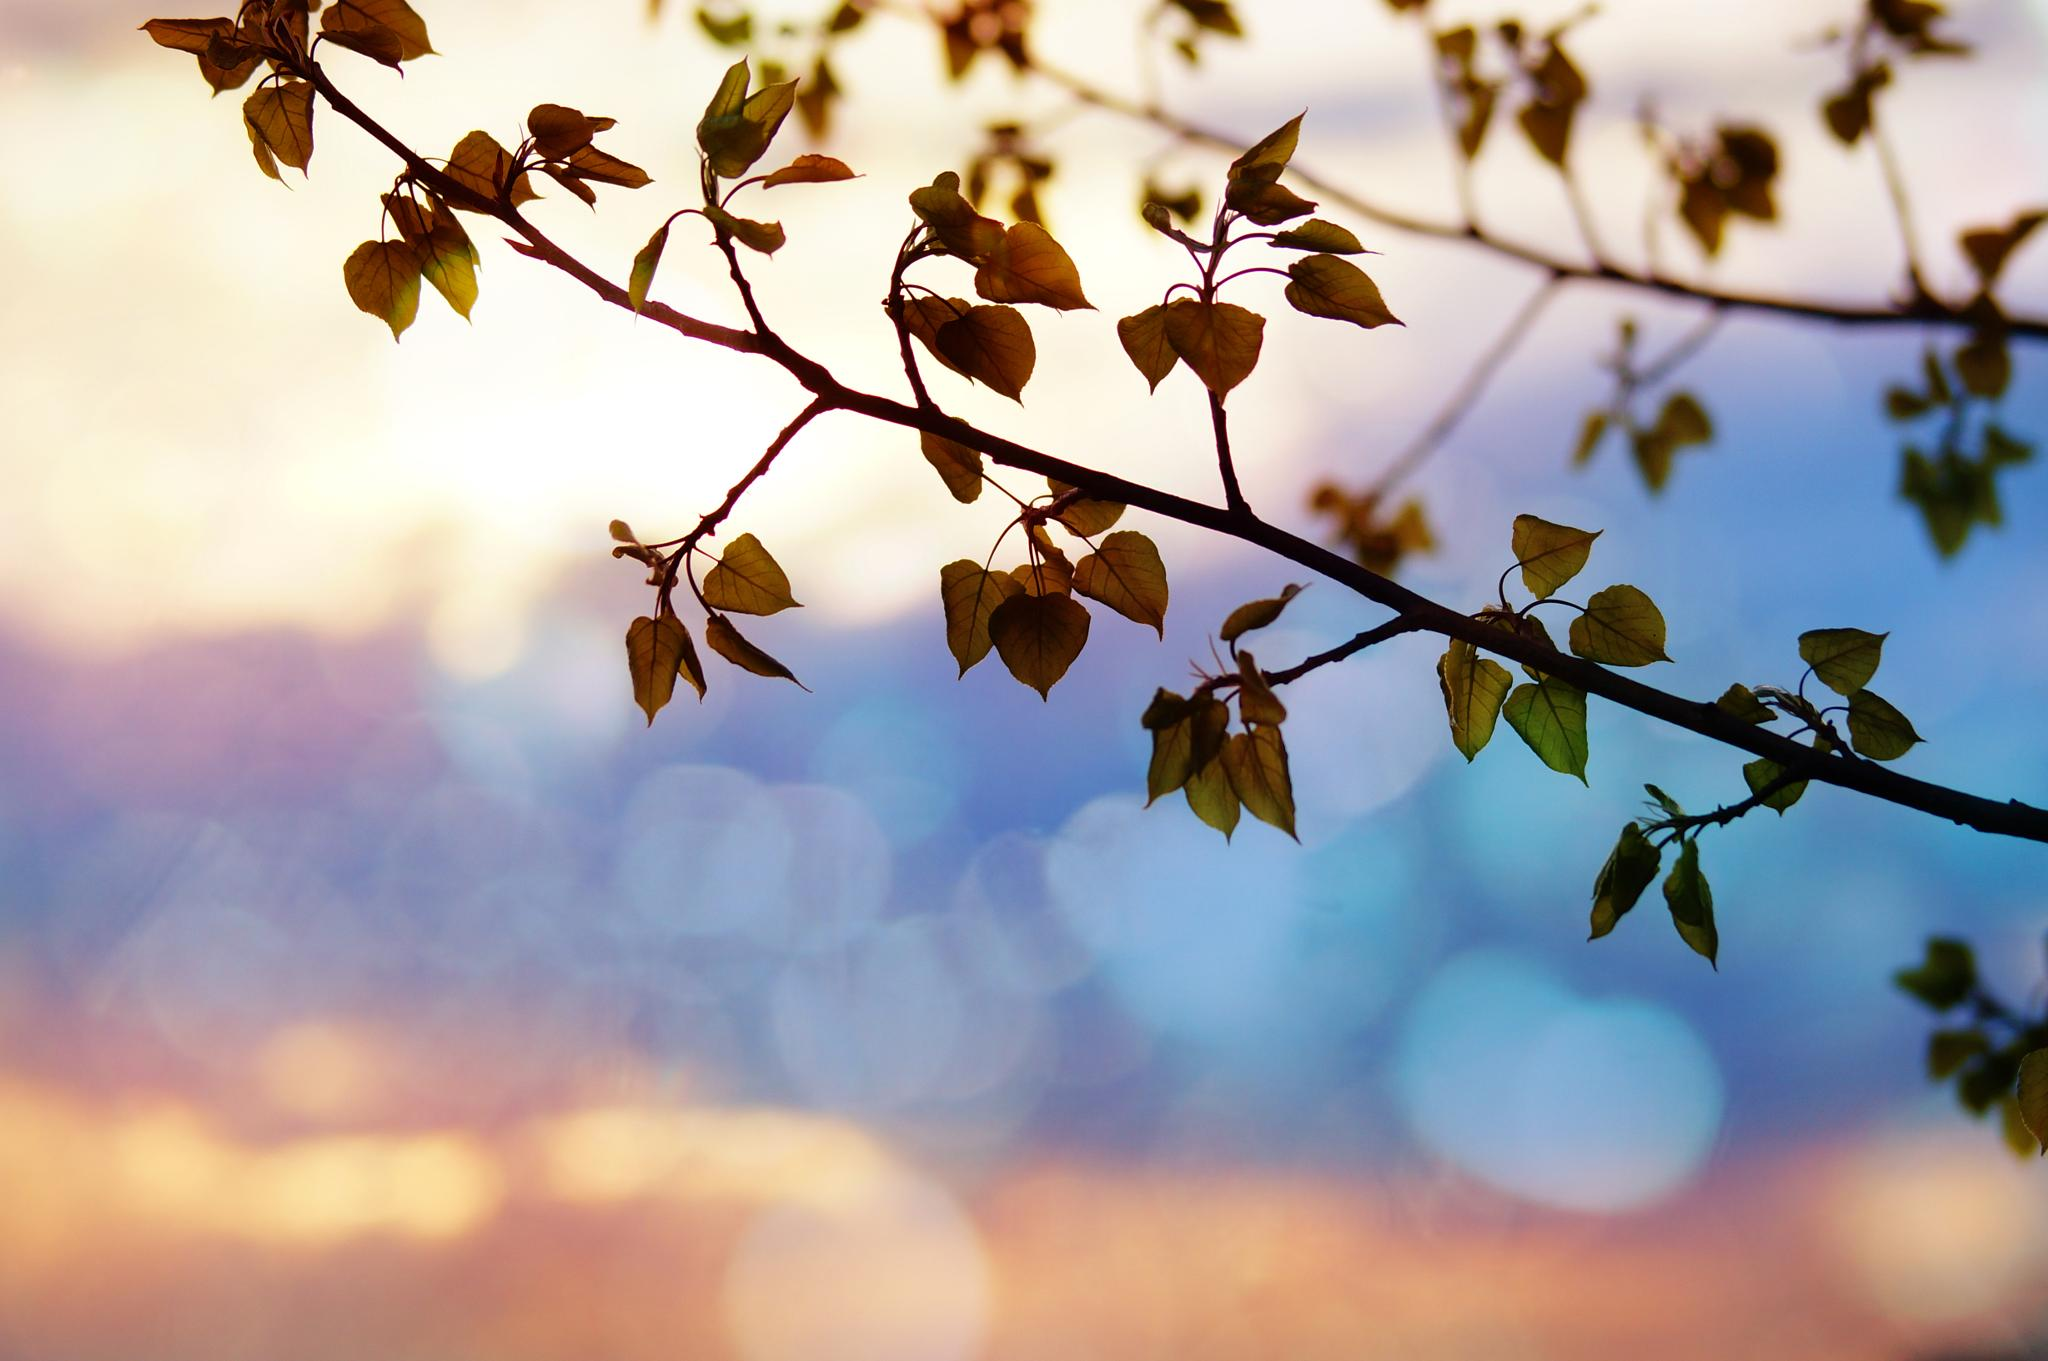 Dramatic sunset, soft color by sylviecorriveau